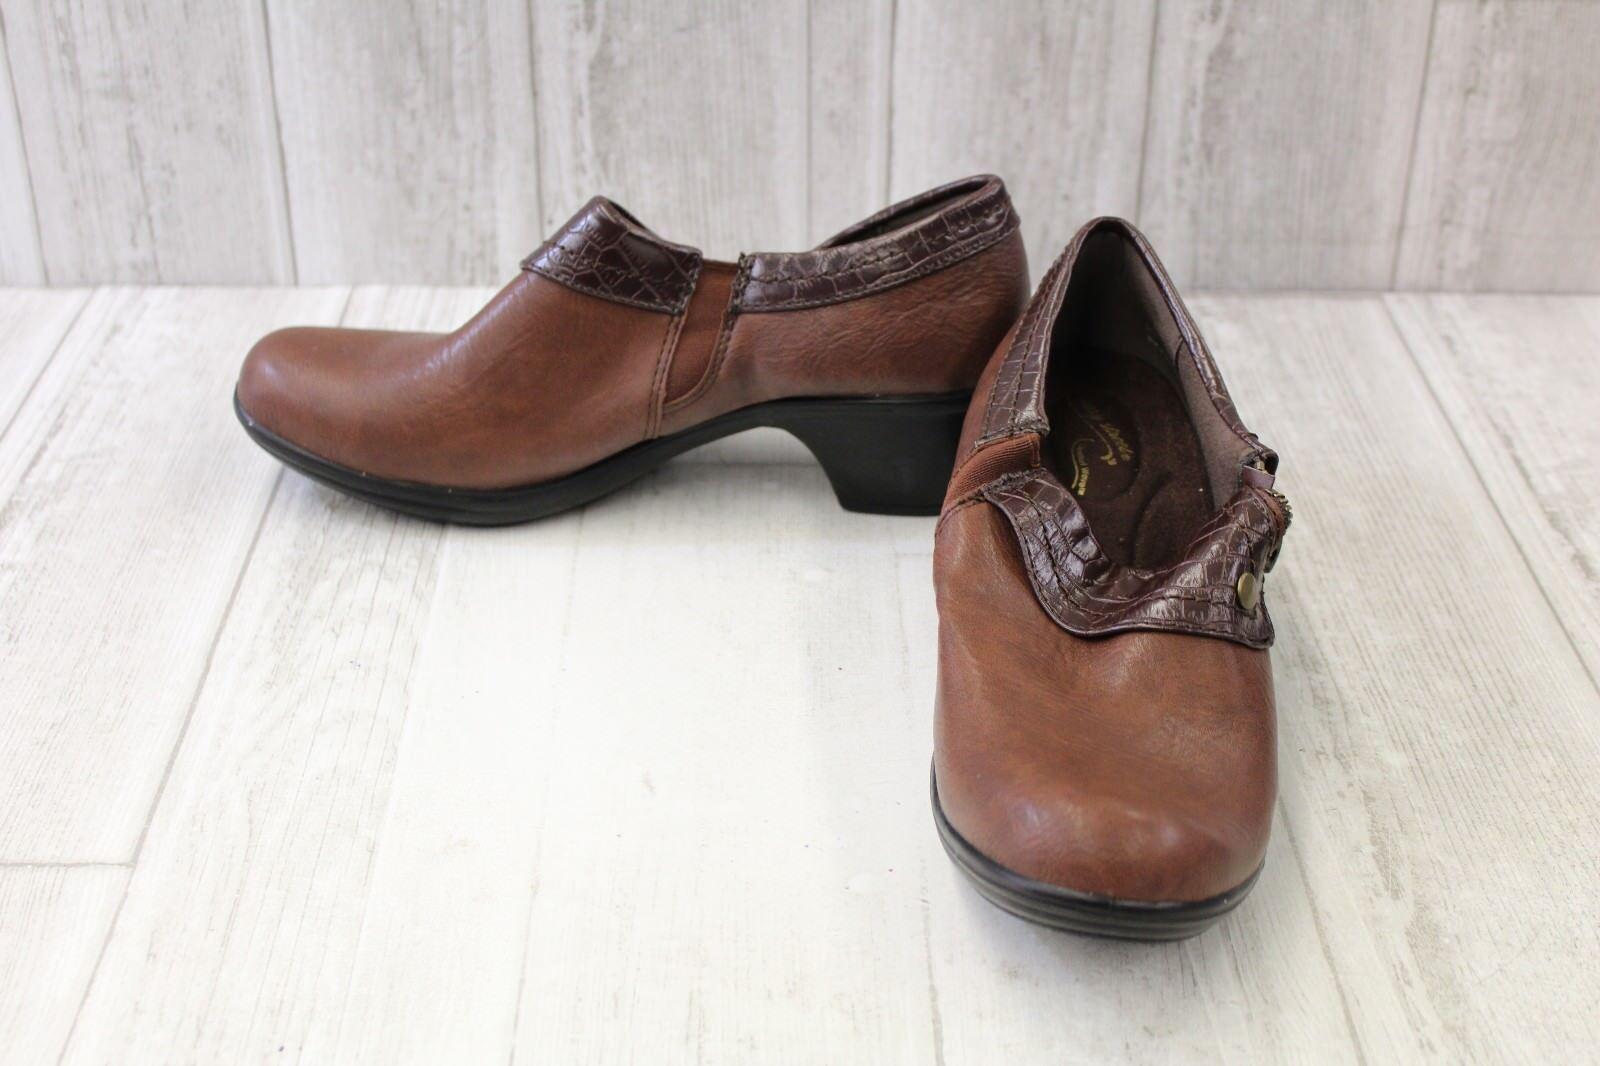 **Easy Street Darcy Booties - Women's Size 8.5 M, Brown